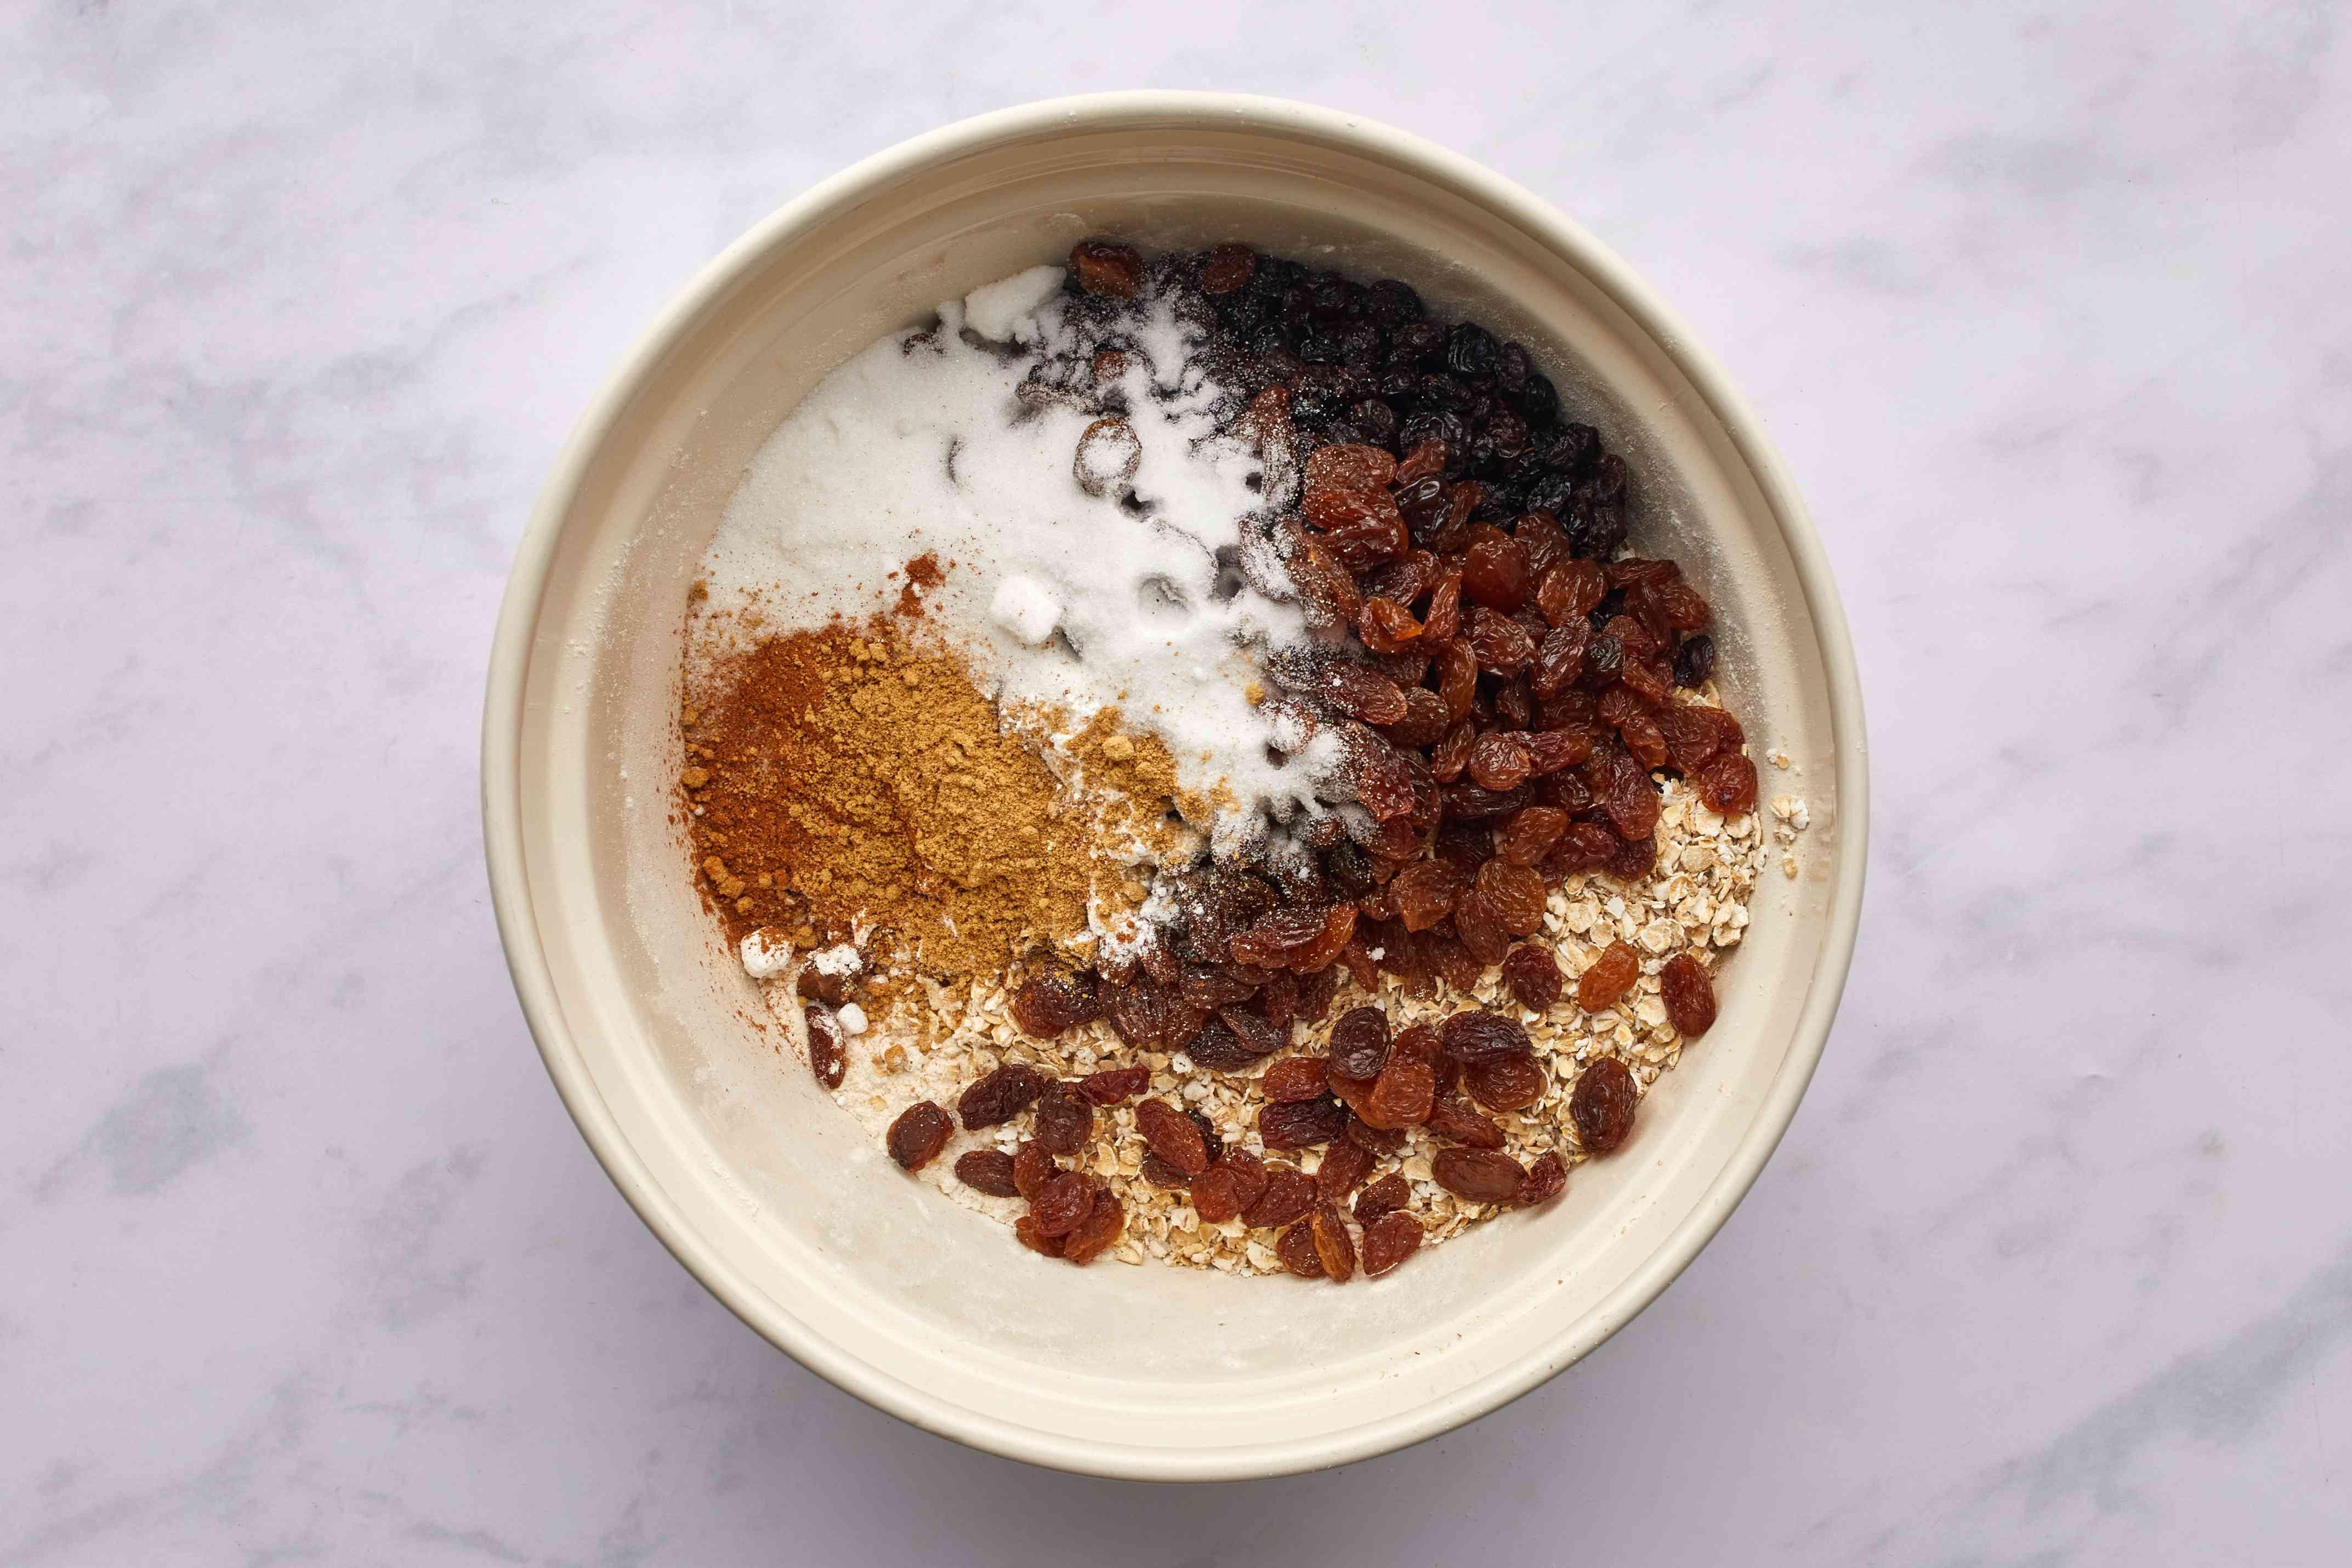 oatmeal, sultanas, dried currants, sugar, baking powder, ginger, flour and cinnamon in a bowl